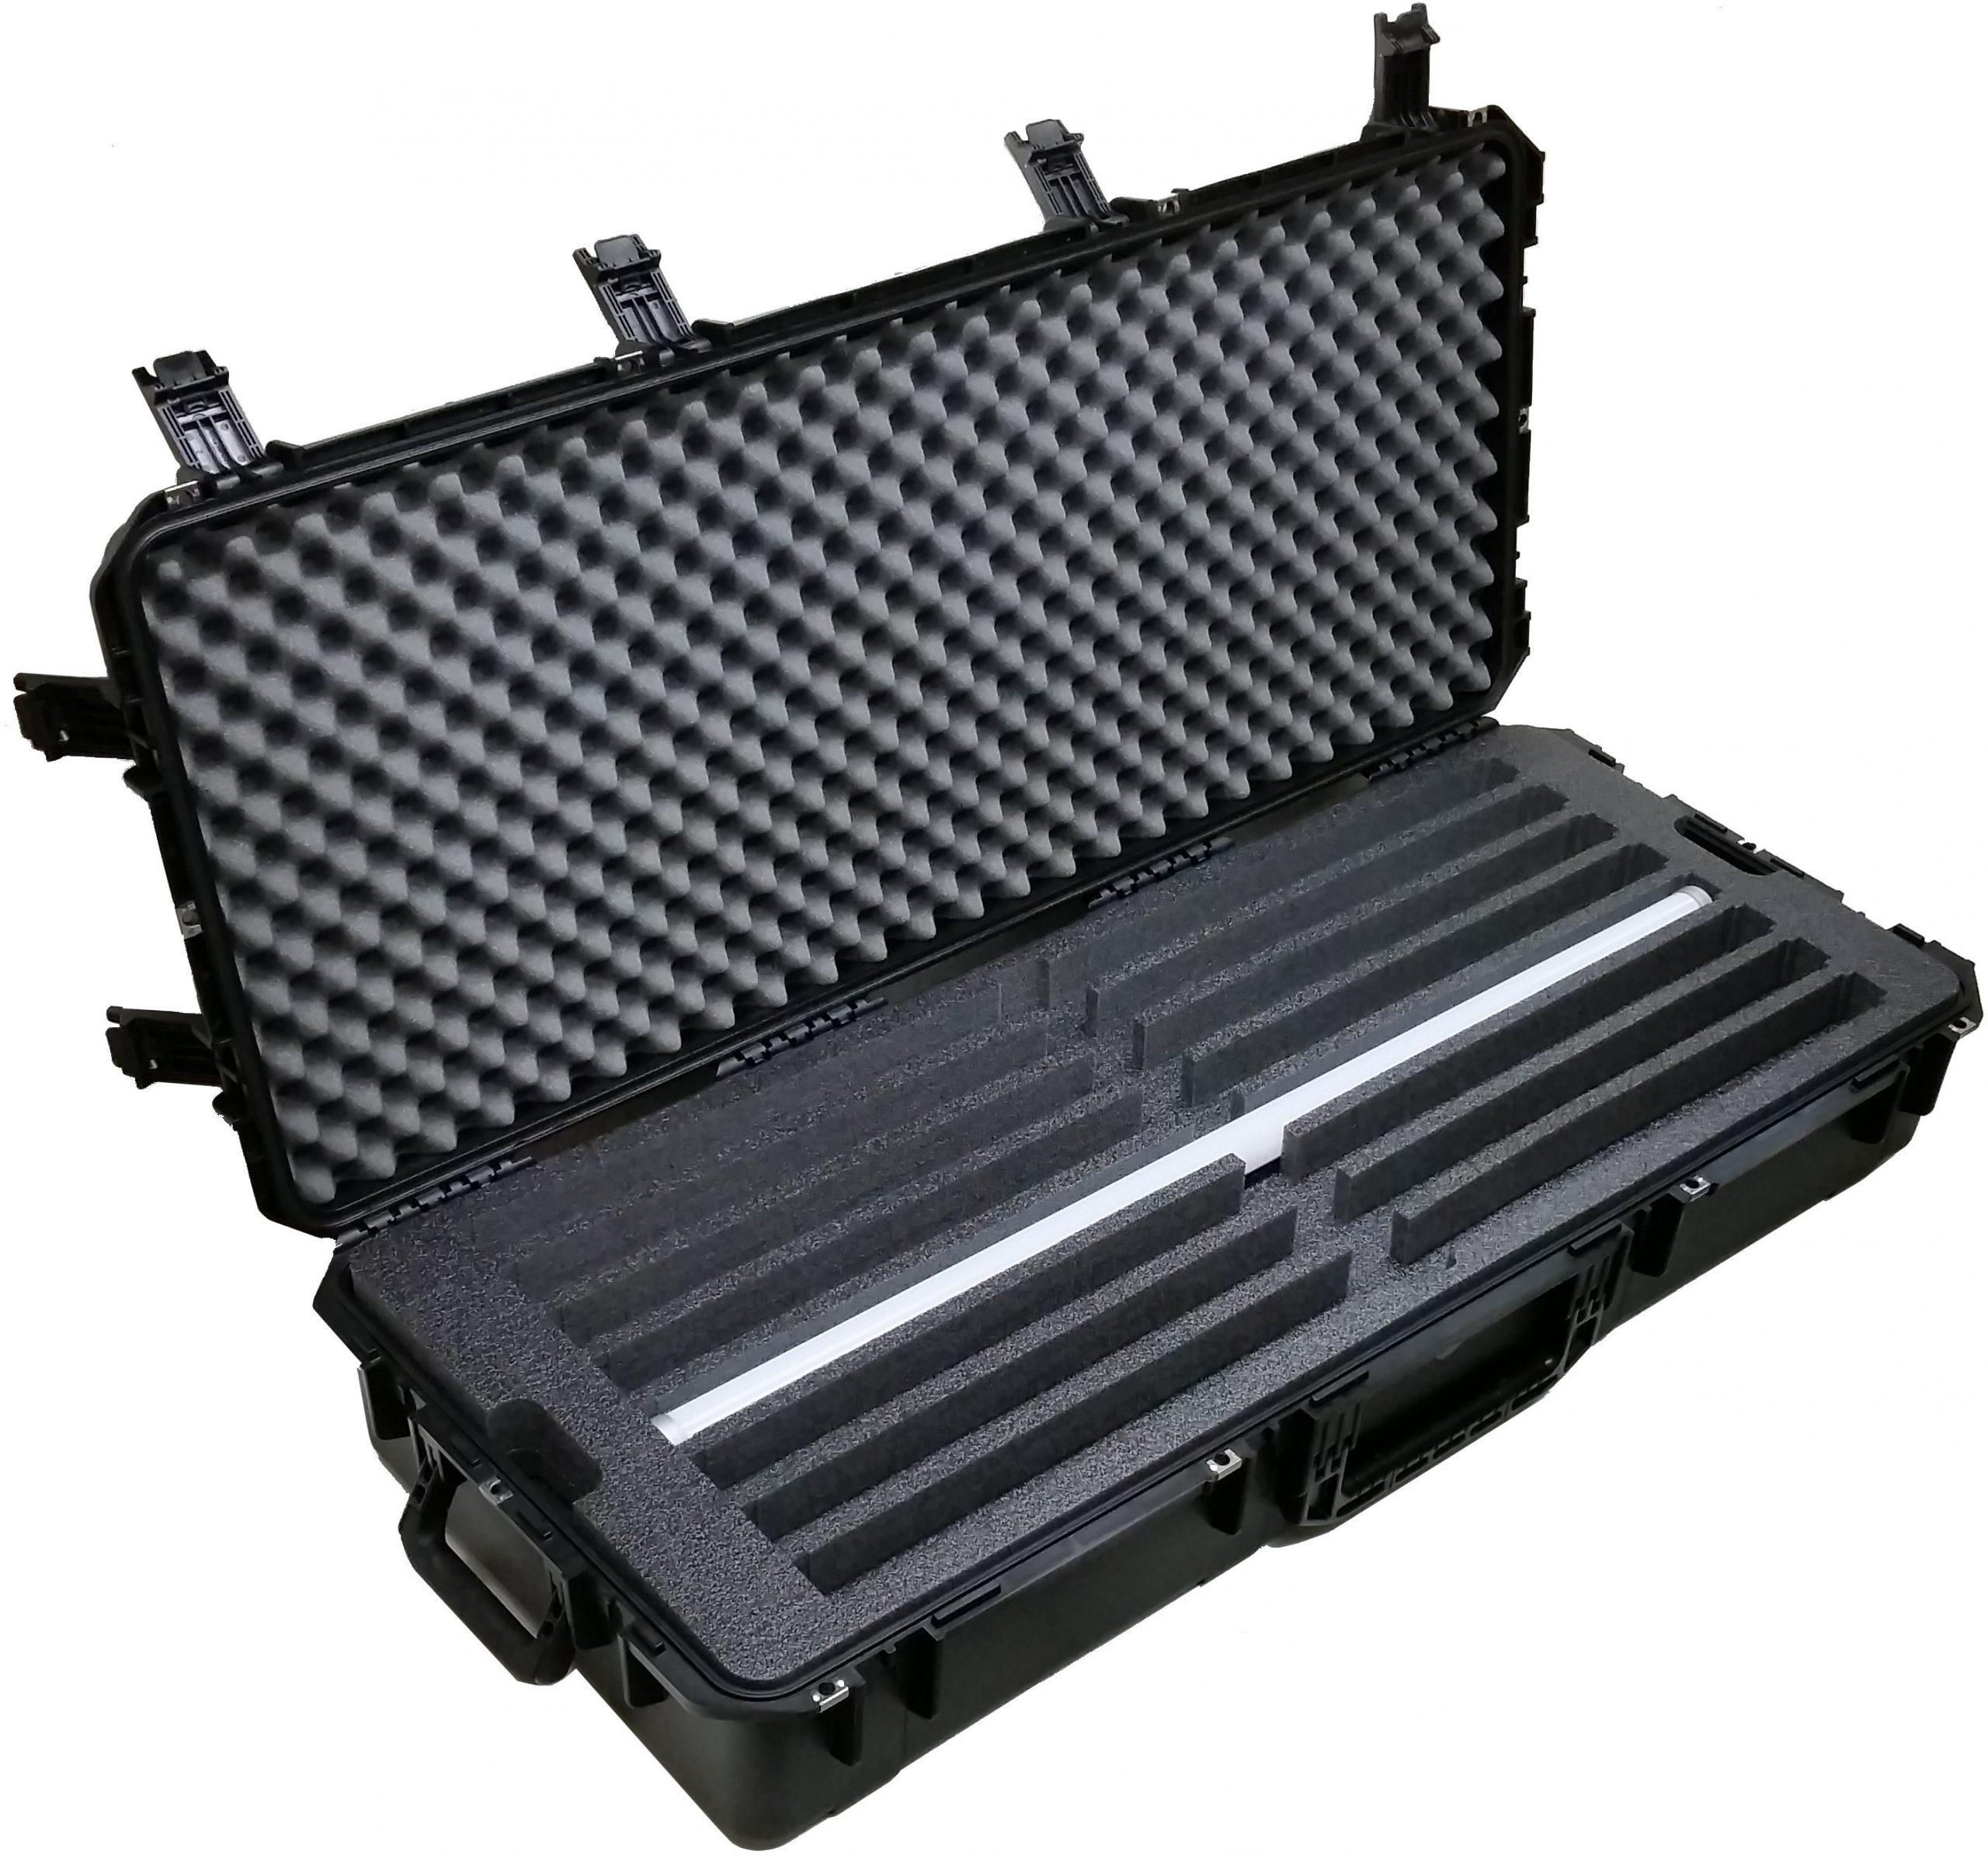 Case Club CC471983ISK Case Custom Foam Example: Astera LED AX1-U PixelTube Light Case